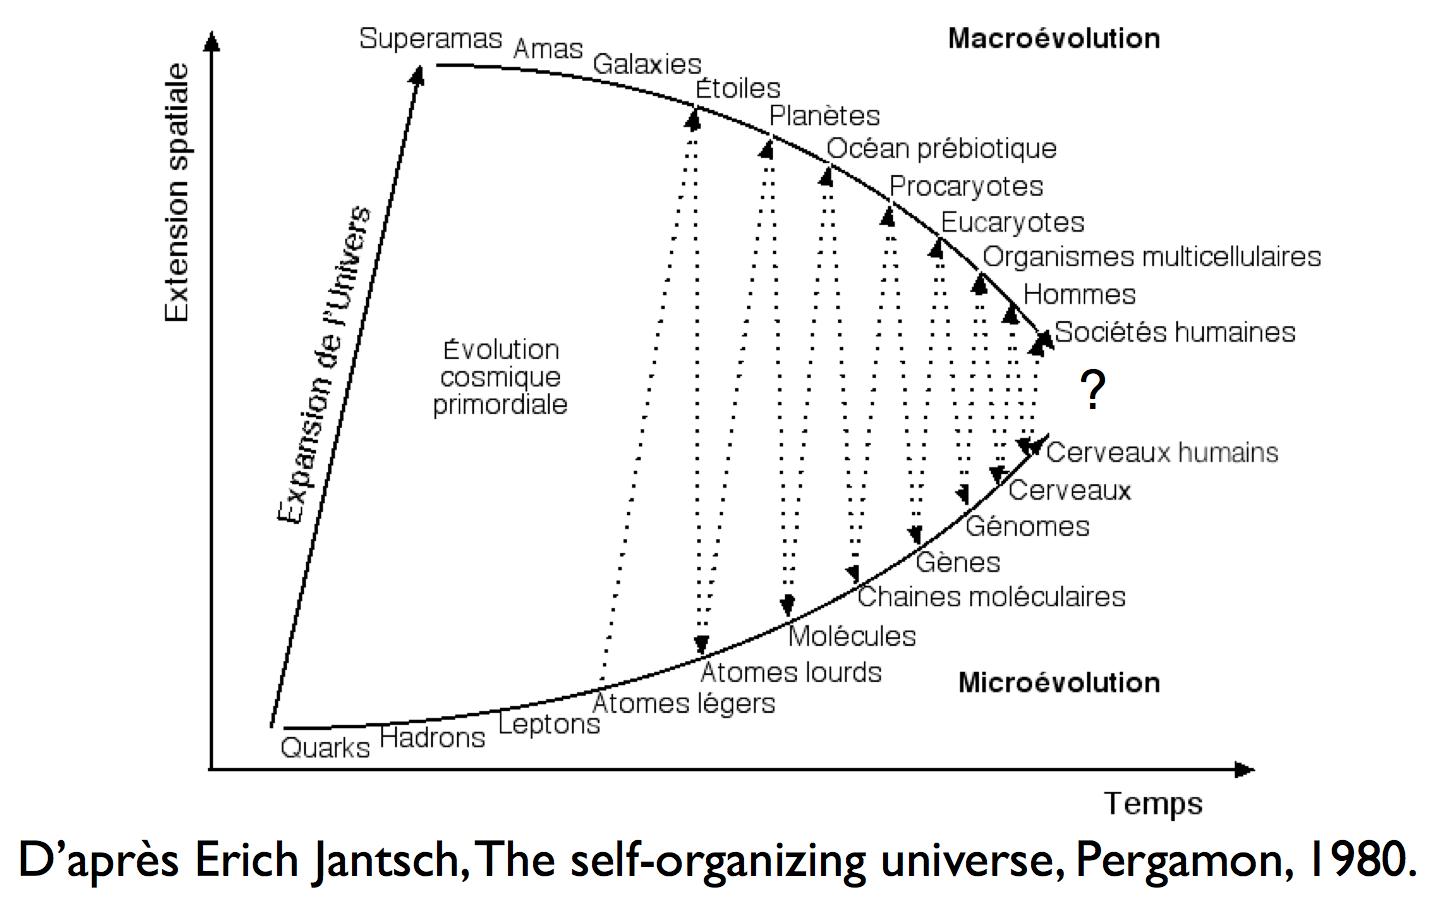 The self-organizing universe